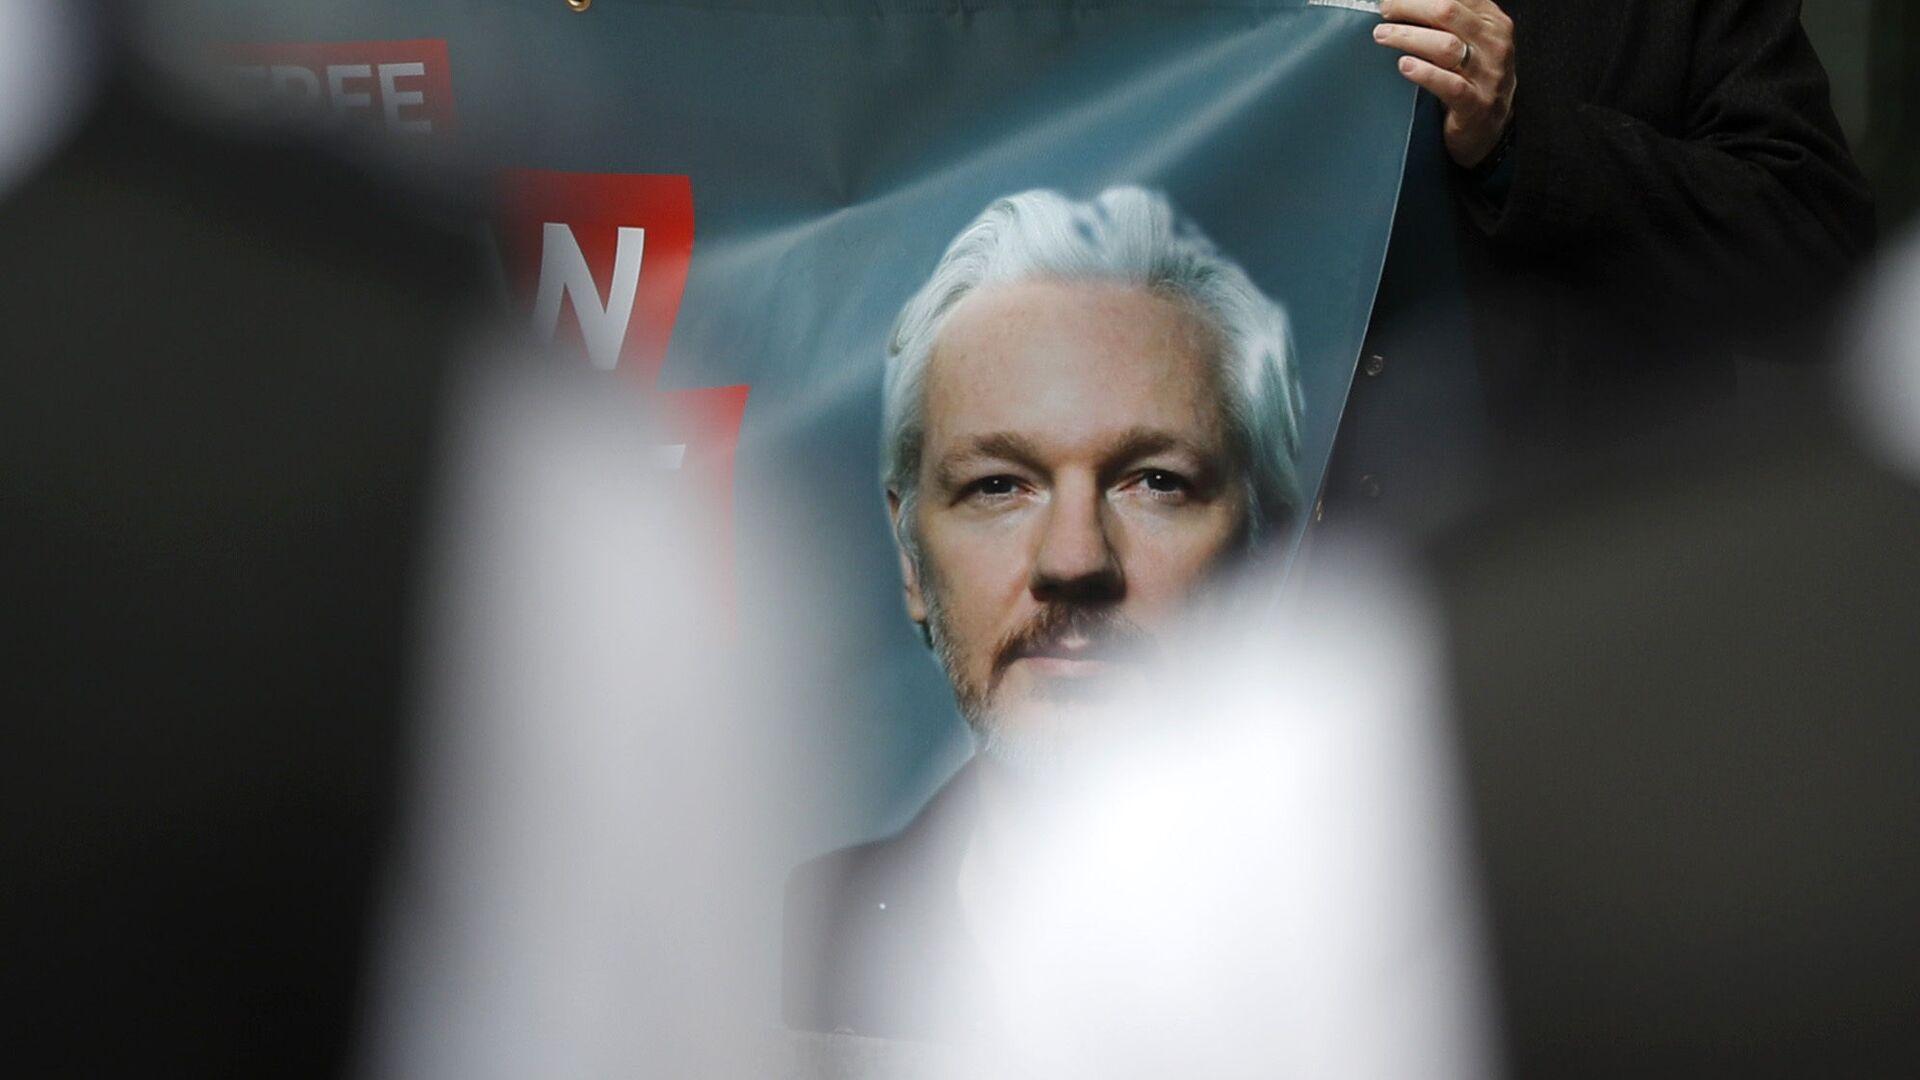 Retrato de Julian Assange, fundador de Wikileaks - Sputnik Mundo, 1920, 27.09.2021